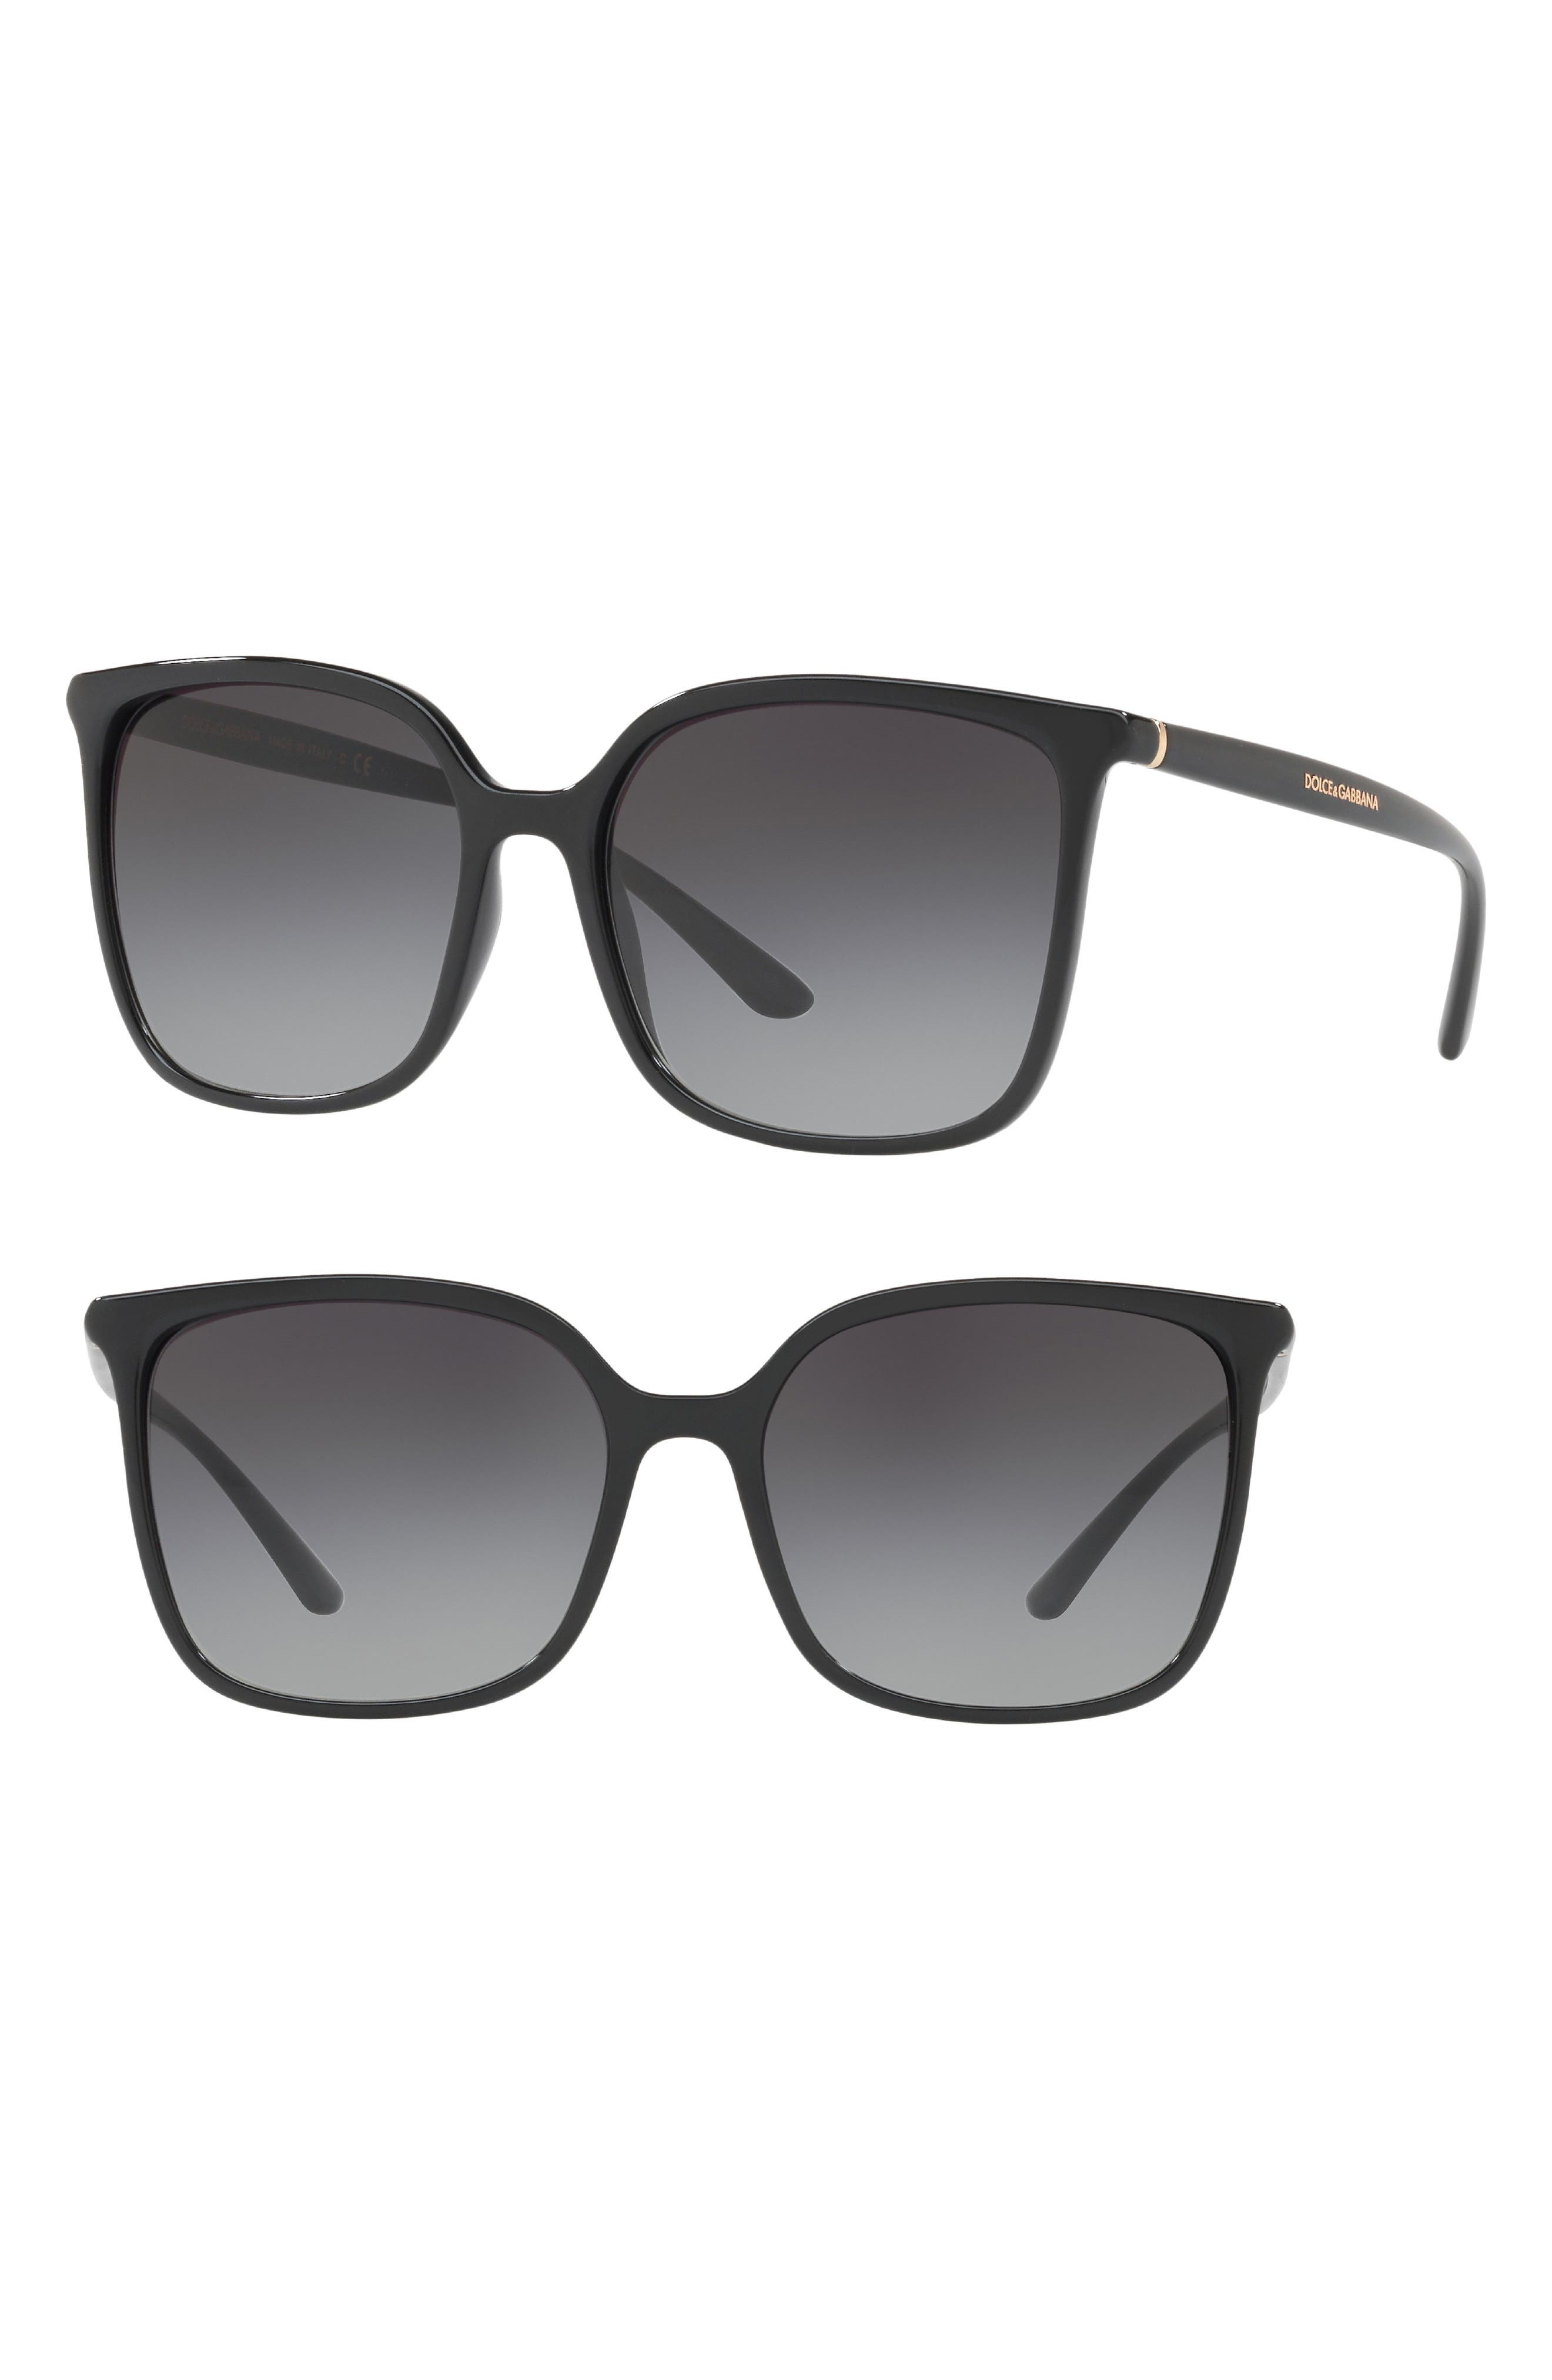 Dolce&Gabbana 56mm Gradient Square Sunglasses